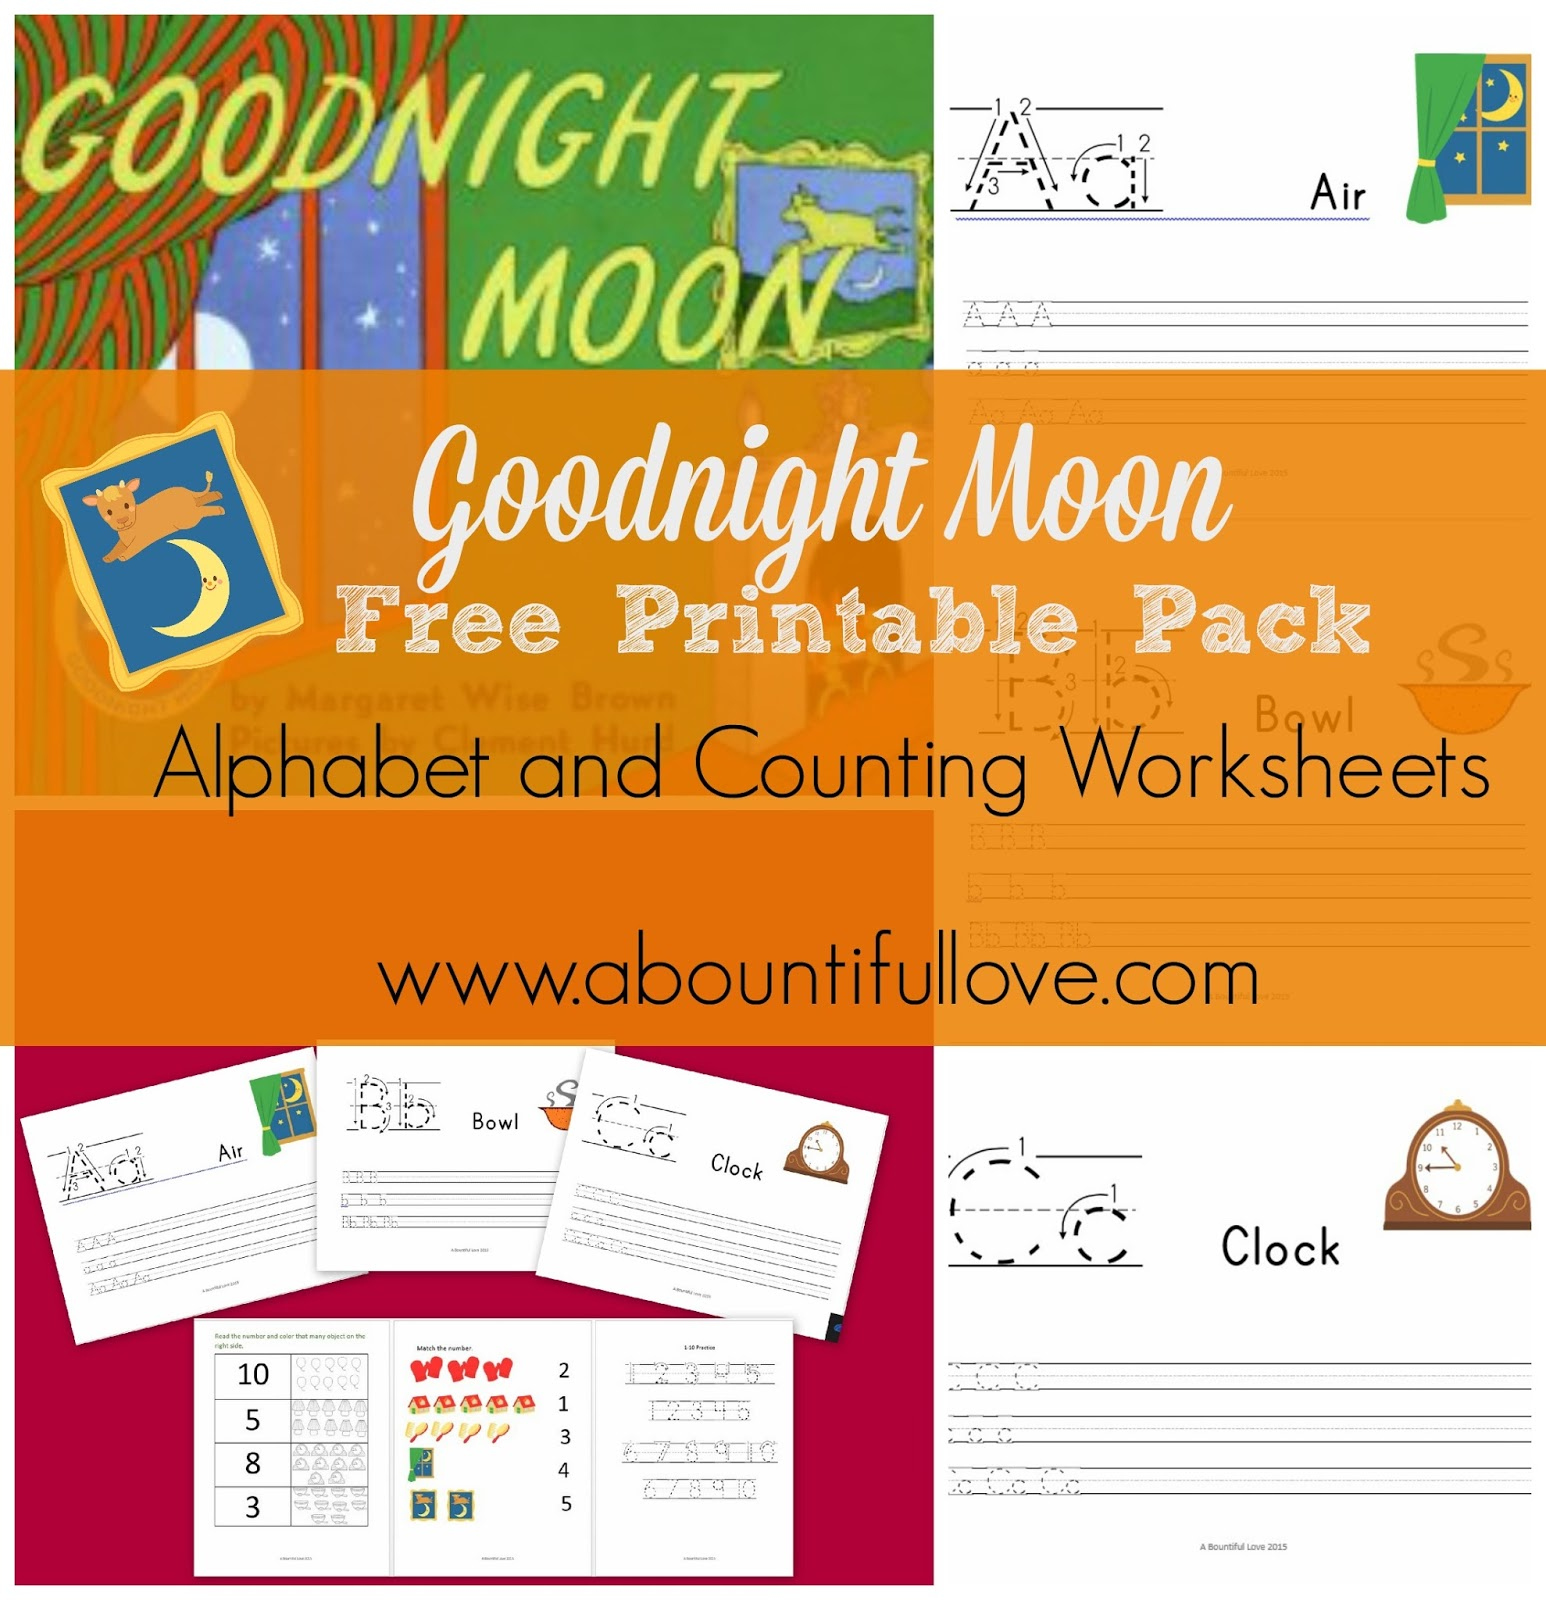 Goodnight Moon Free Printable Pack